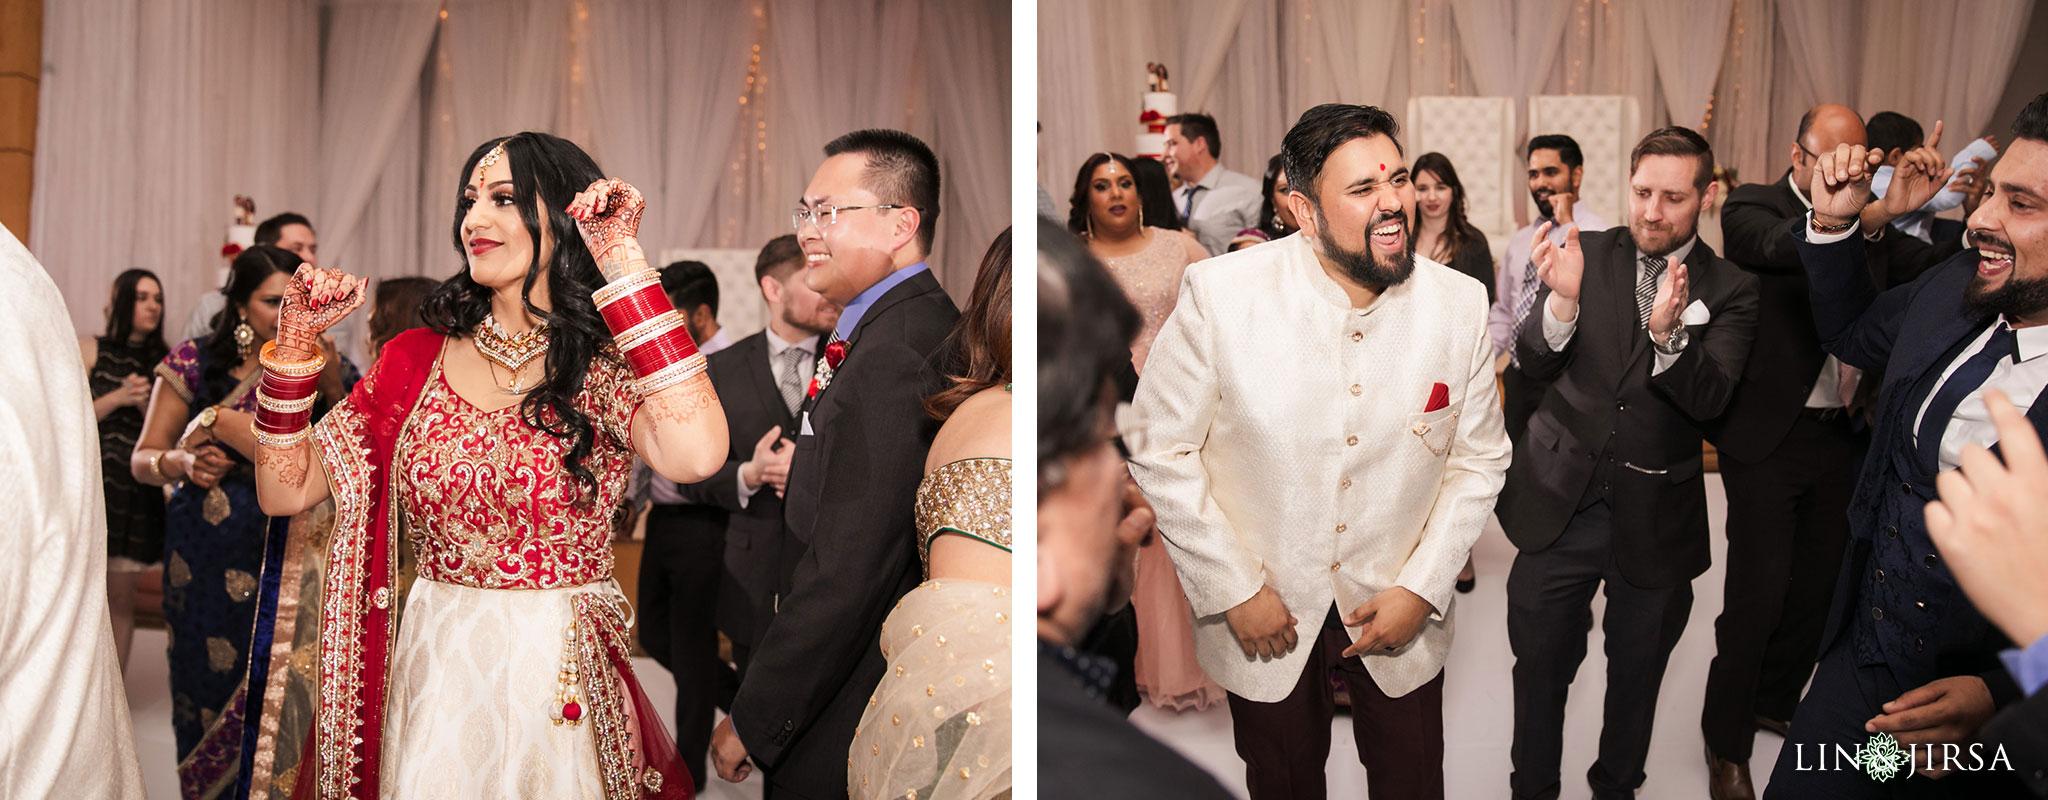 38 Diamond Bar Center Inland Empire Indian Wedding Photography